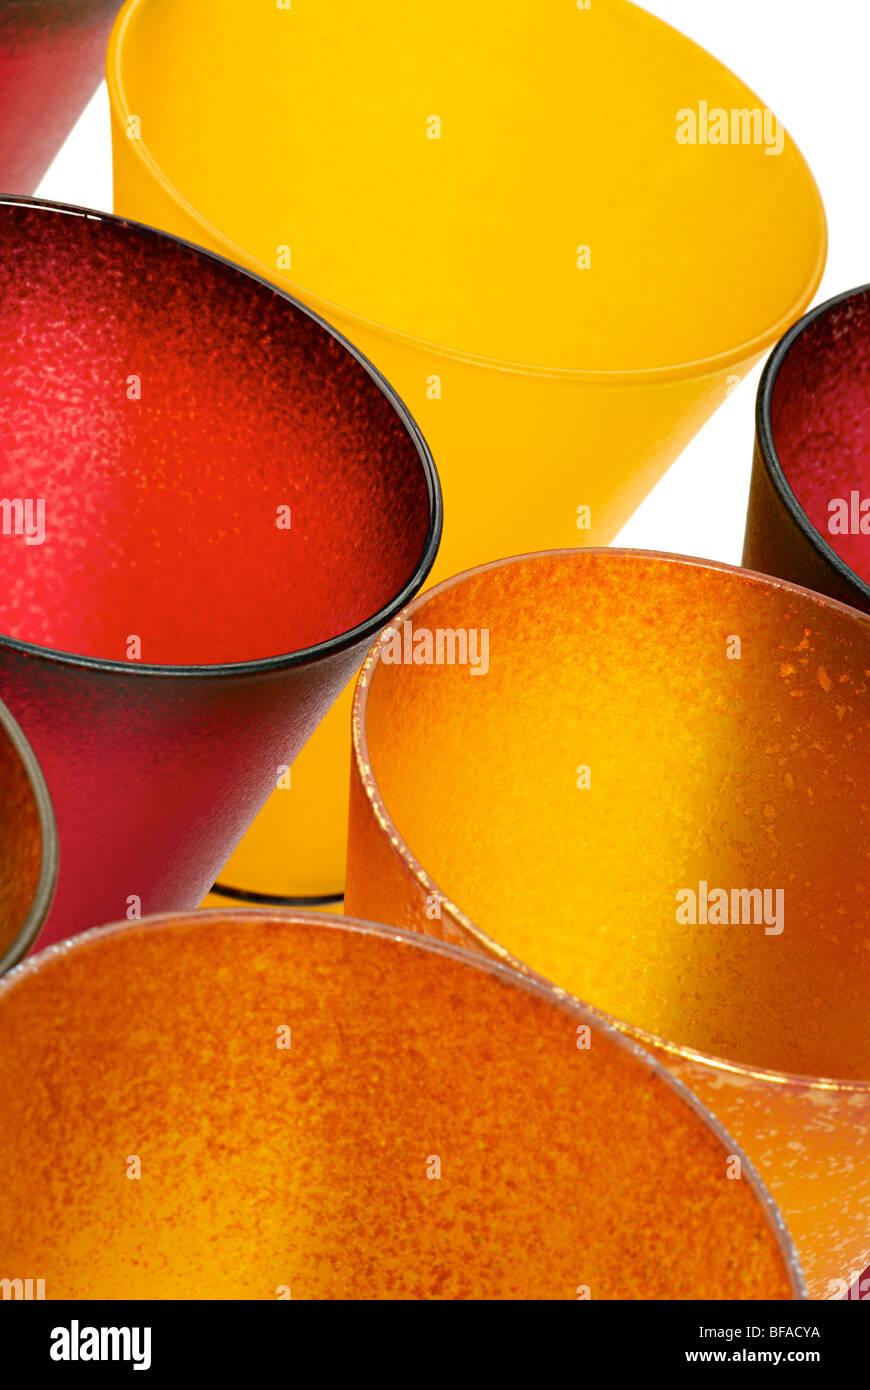 Photo of yellow and red glasses. Macro. Stock Photo